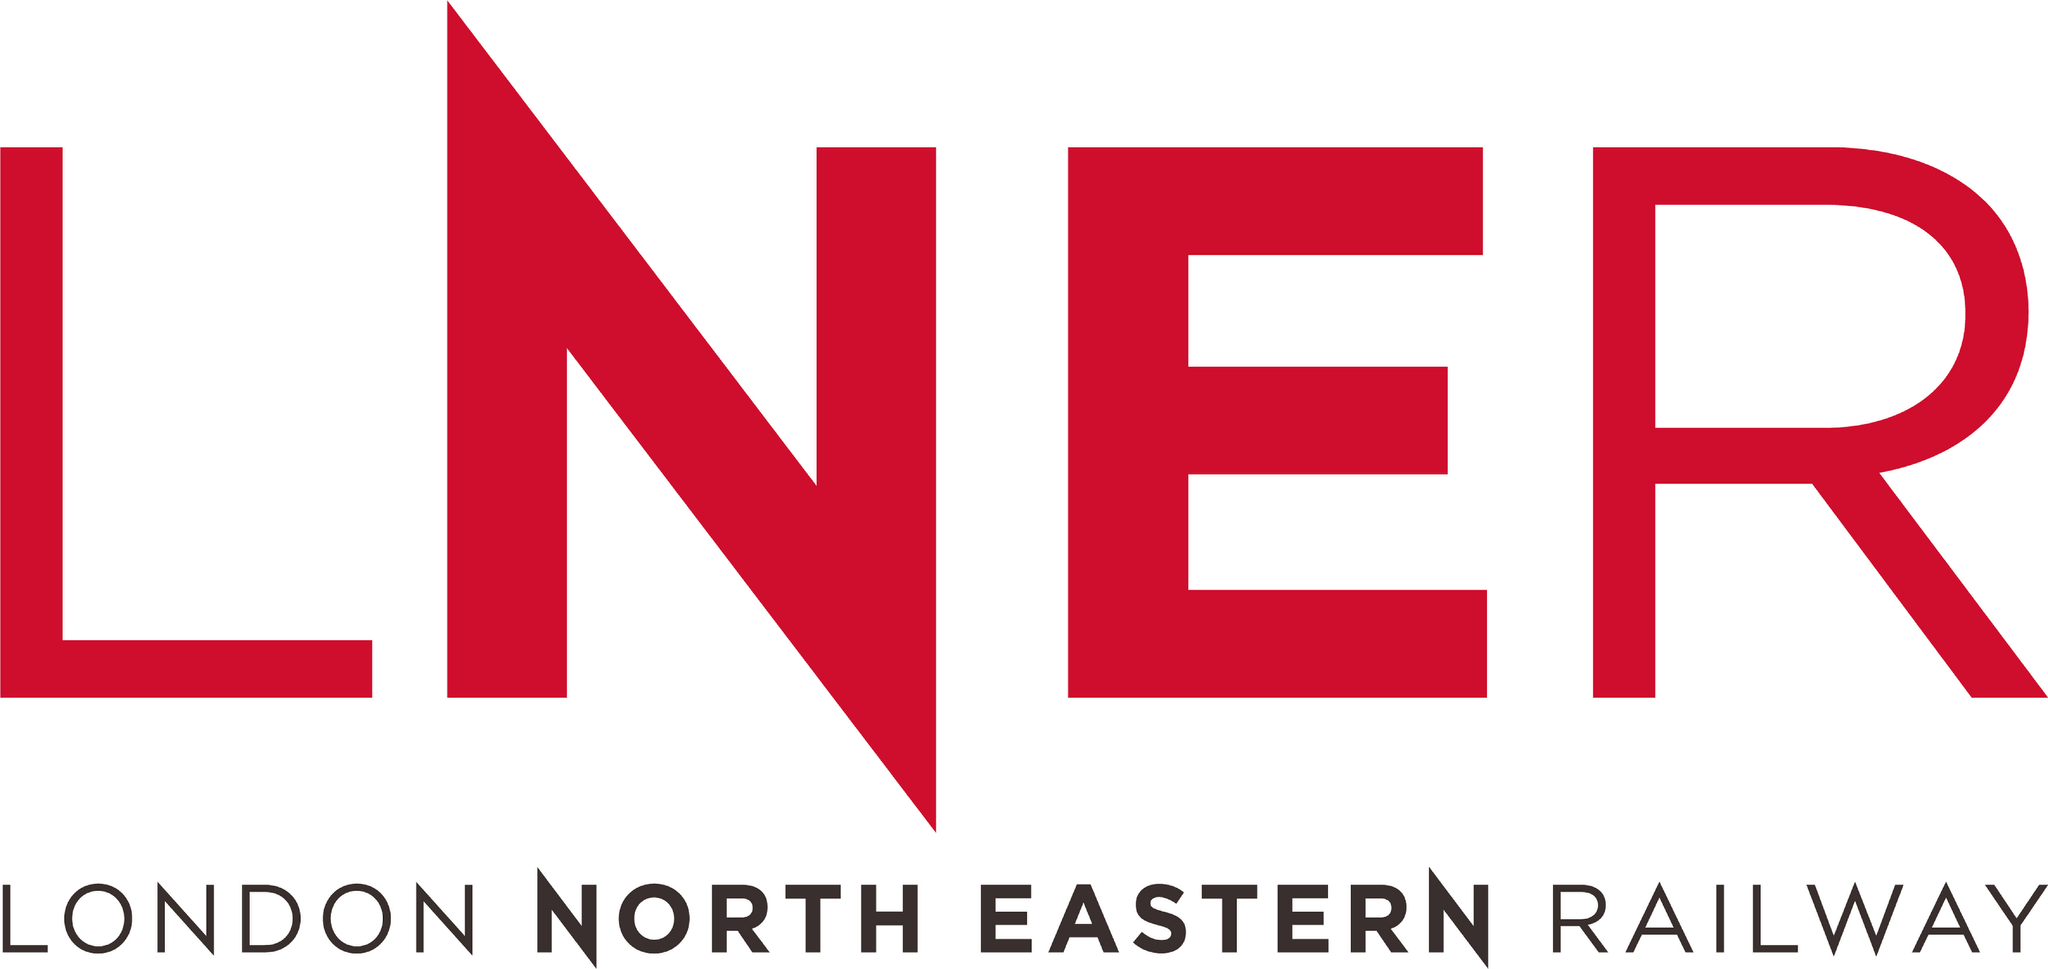 London North Eastern Railway Ltd